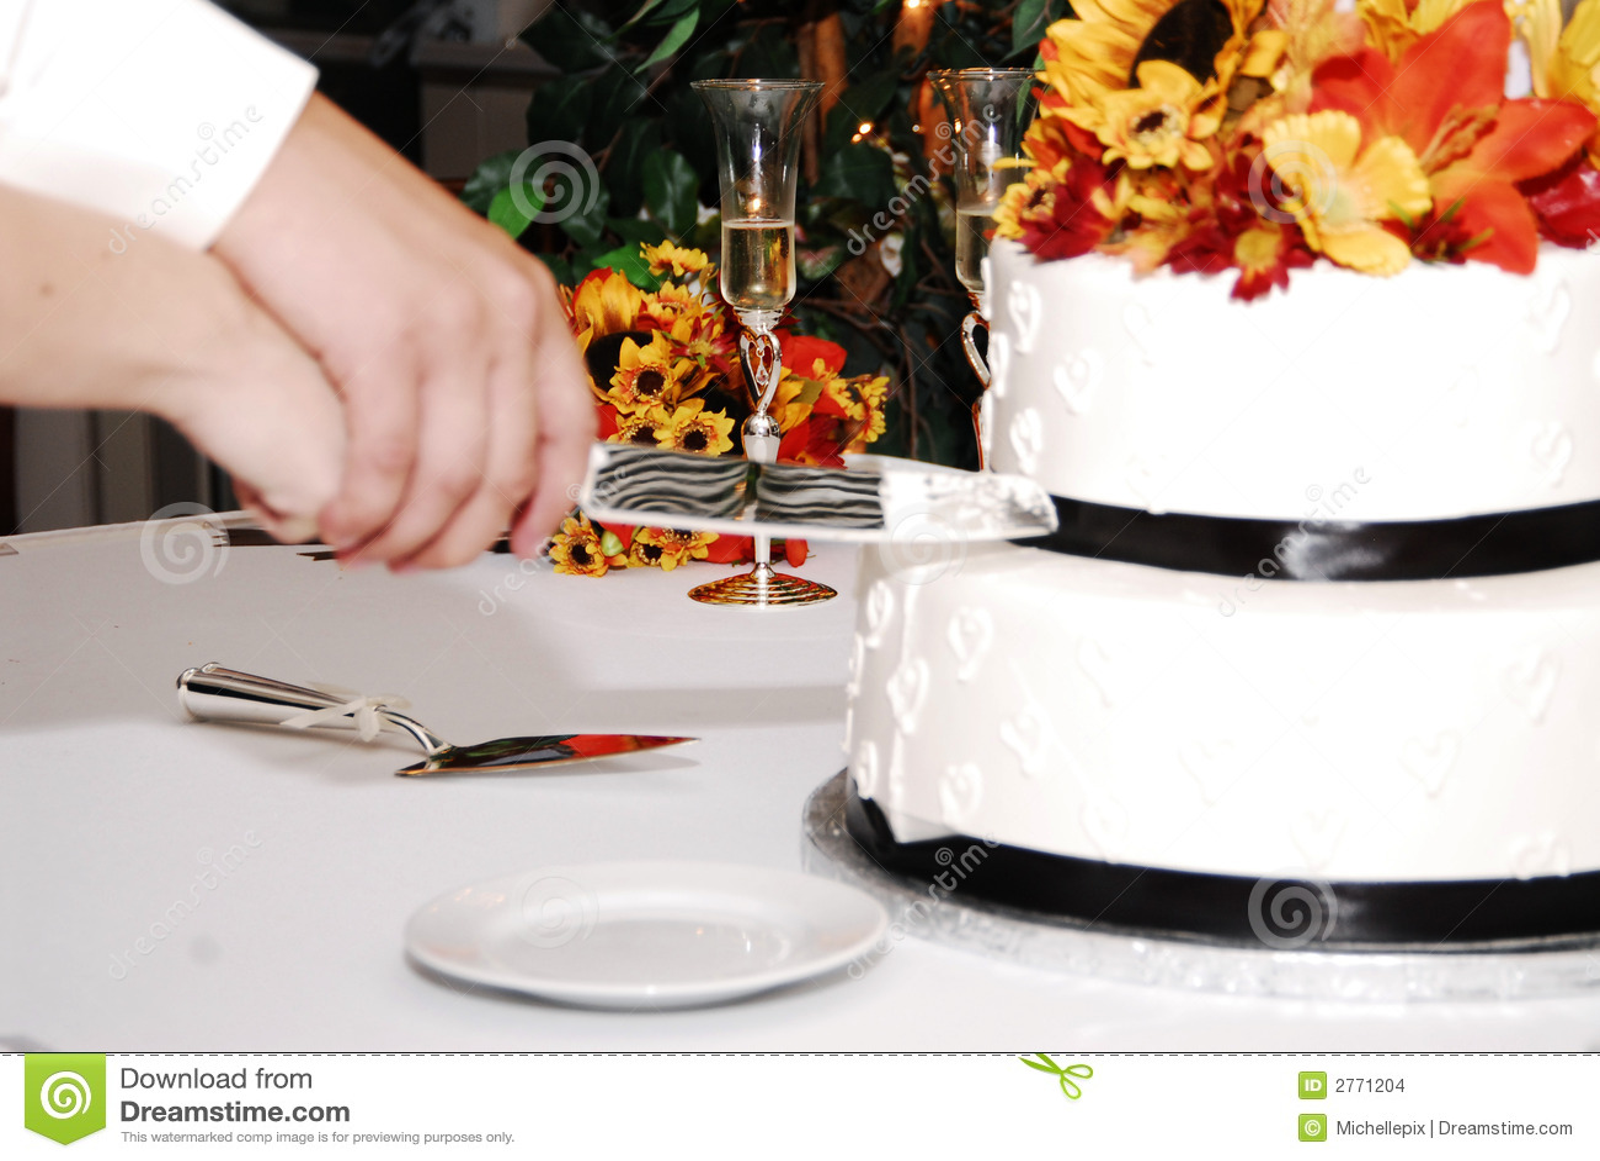 cake cutting stock images image 2771204. Black Bedroom Furniture Sets. Home Design Ideas